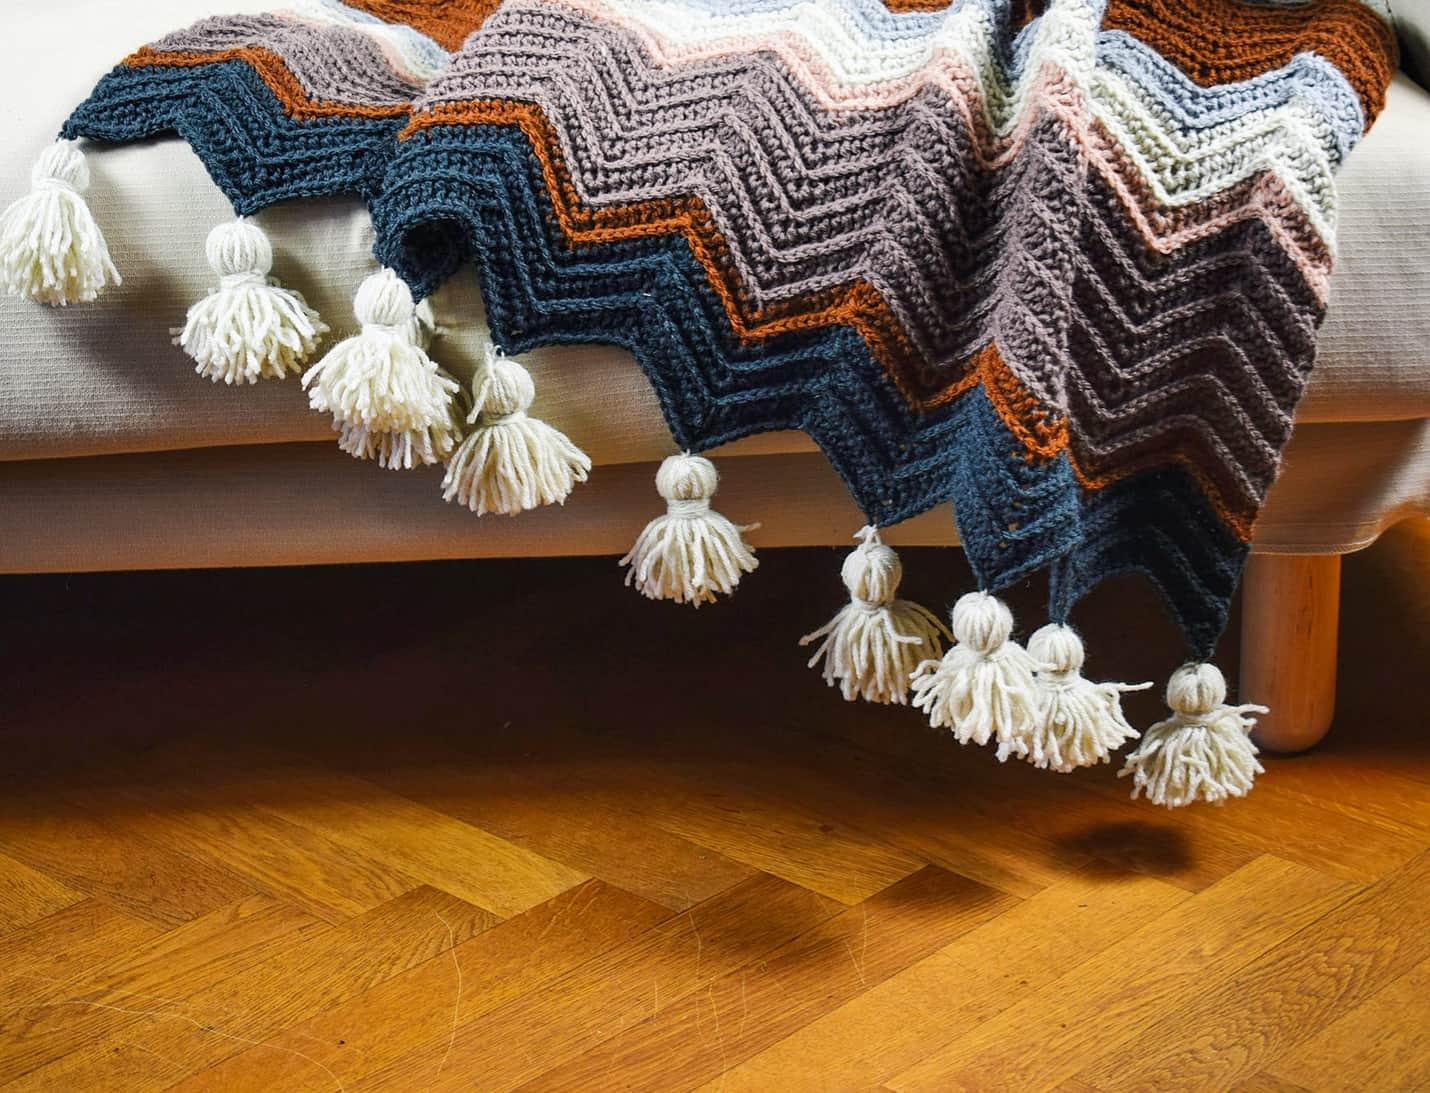 crochet blanket with tassels